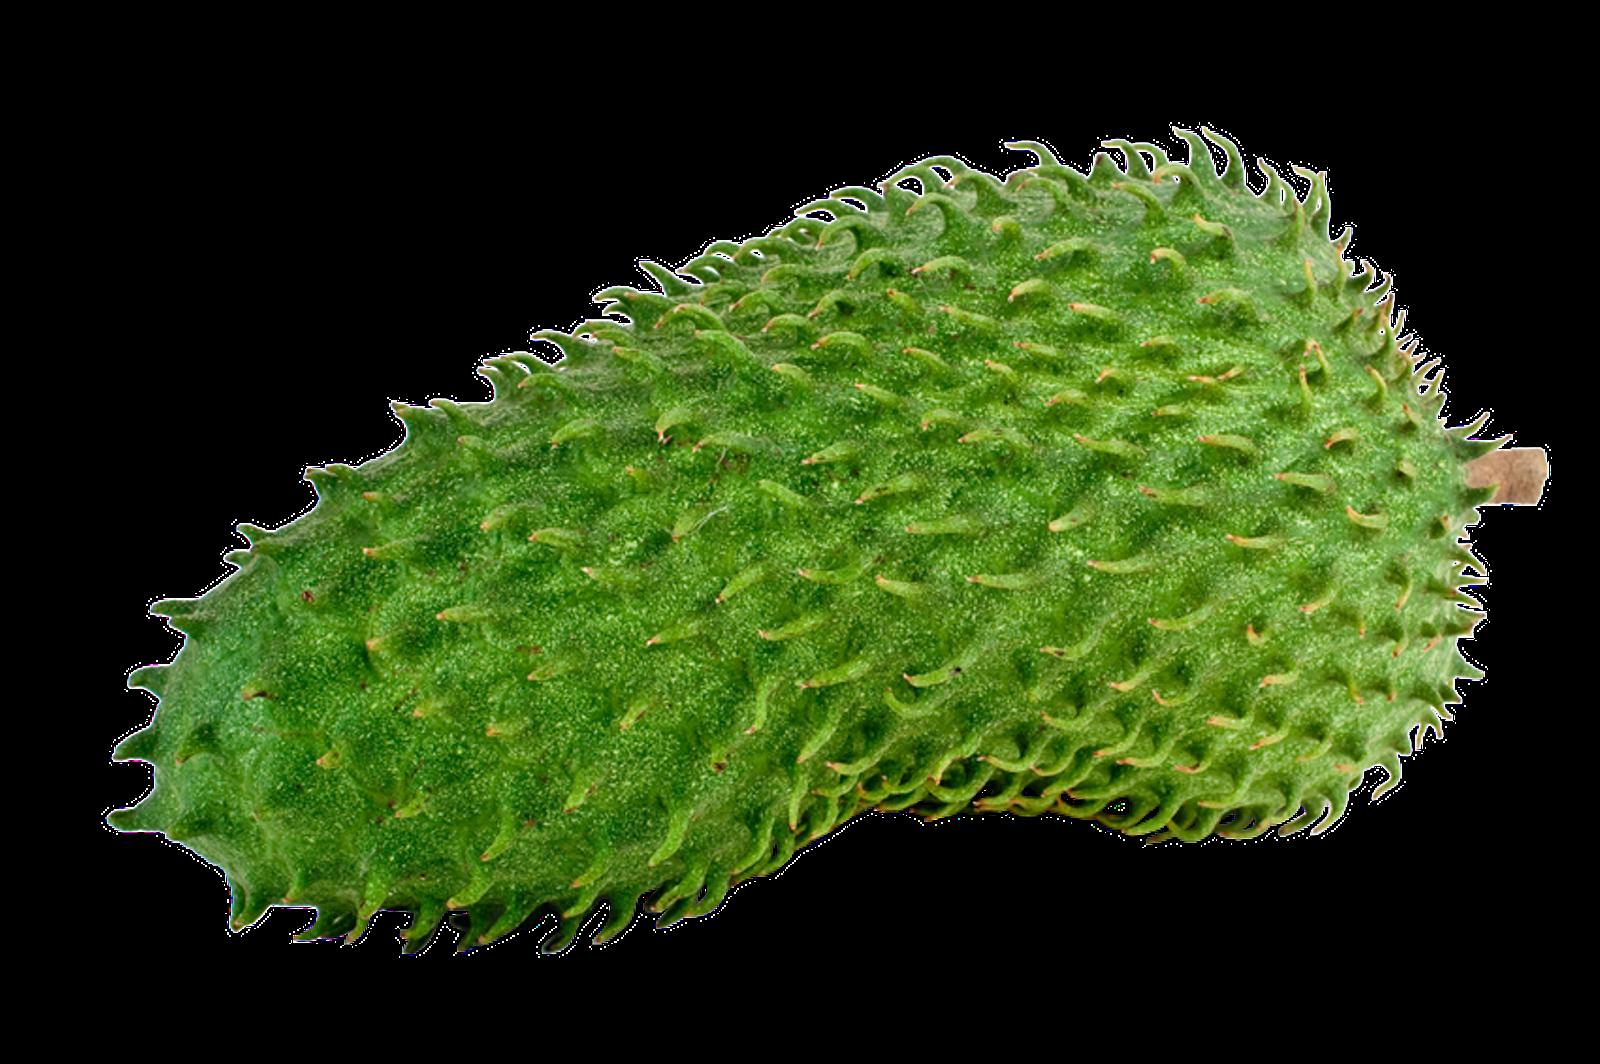 Graviola 100% Frucht - Püree pur. (Guanábana, Stachelannone, Soursop, Guyabano oder Corossol), 6 KG (60x100g Portionen)